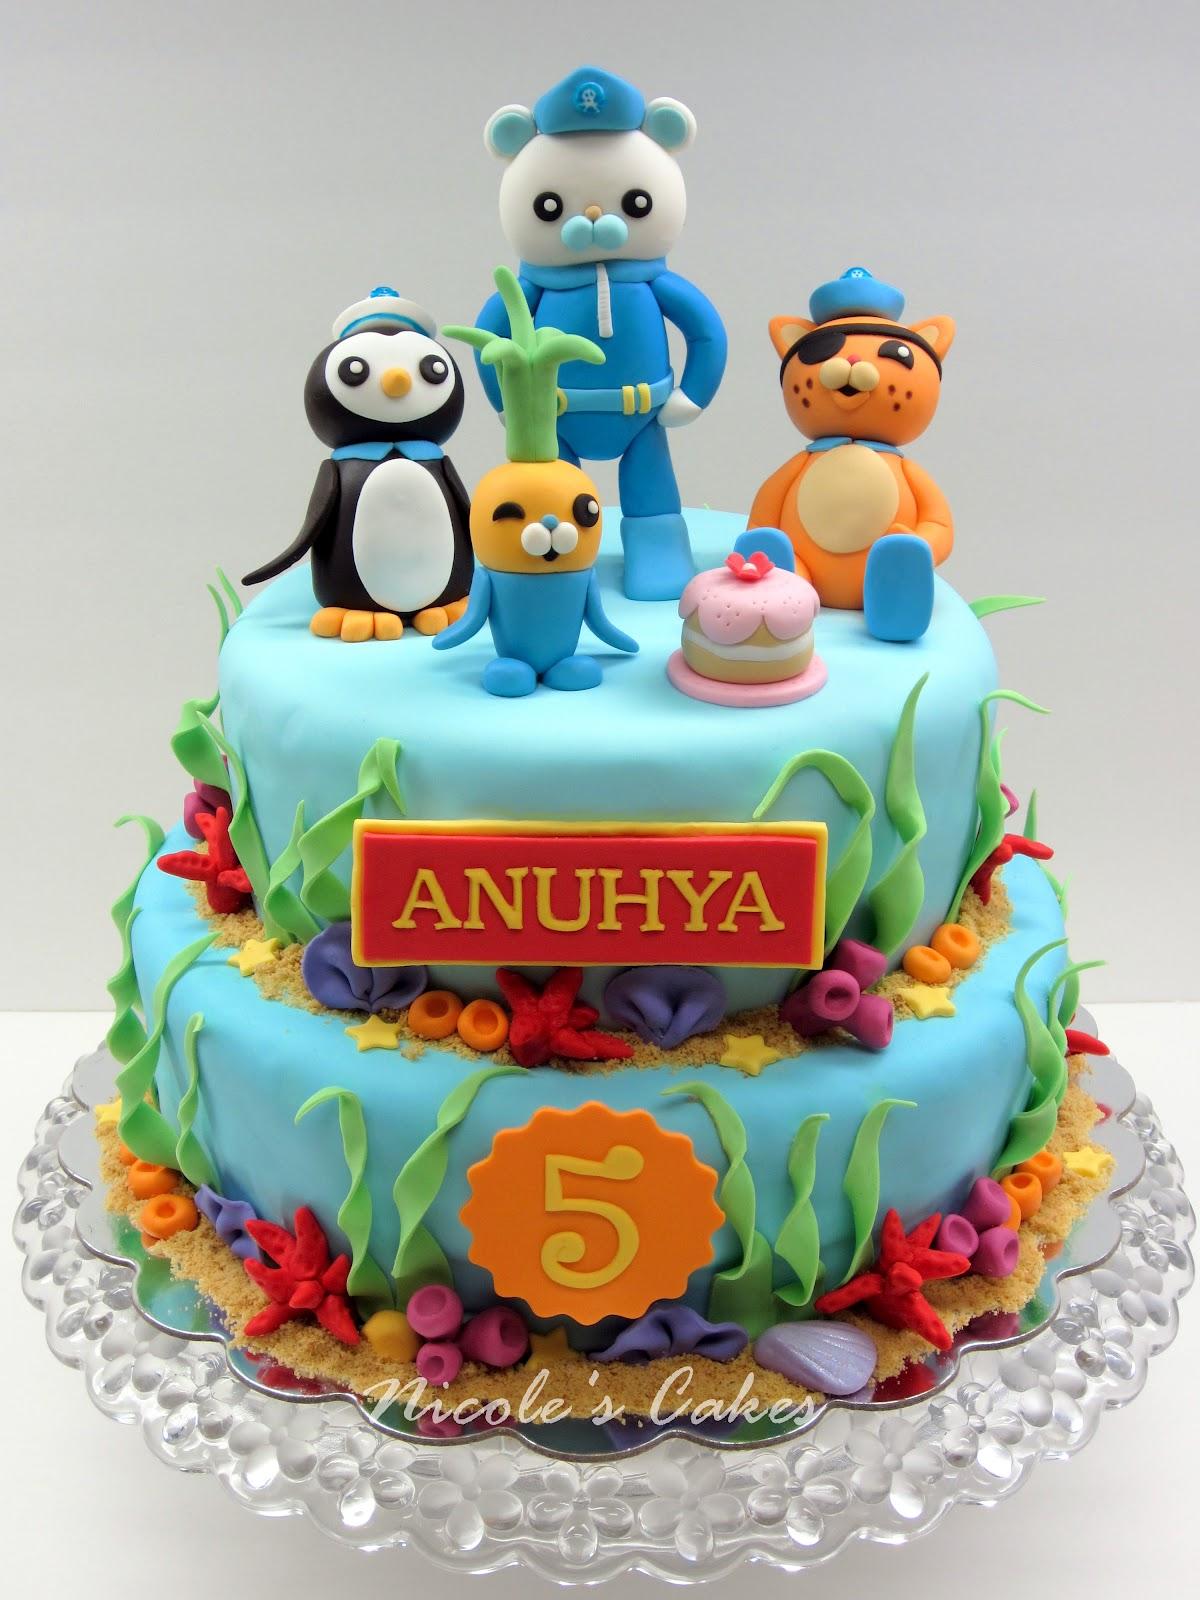 Octonauts Cake Decorations Uk : Confections, Cakes & Creations!: The Octonauts Cake!